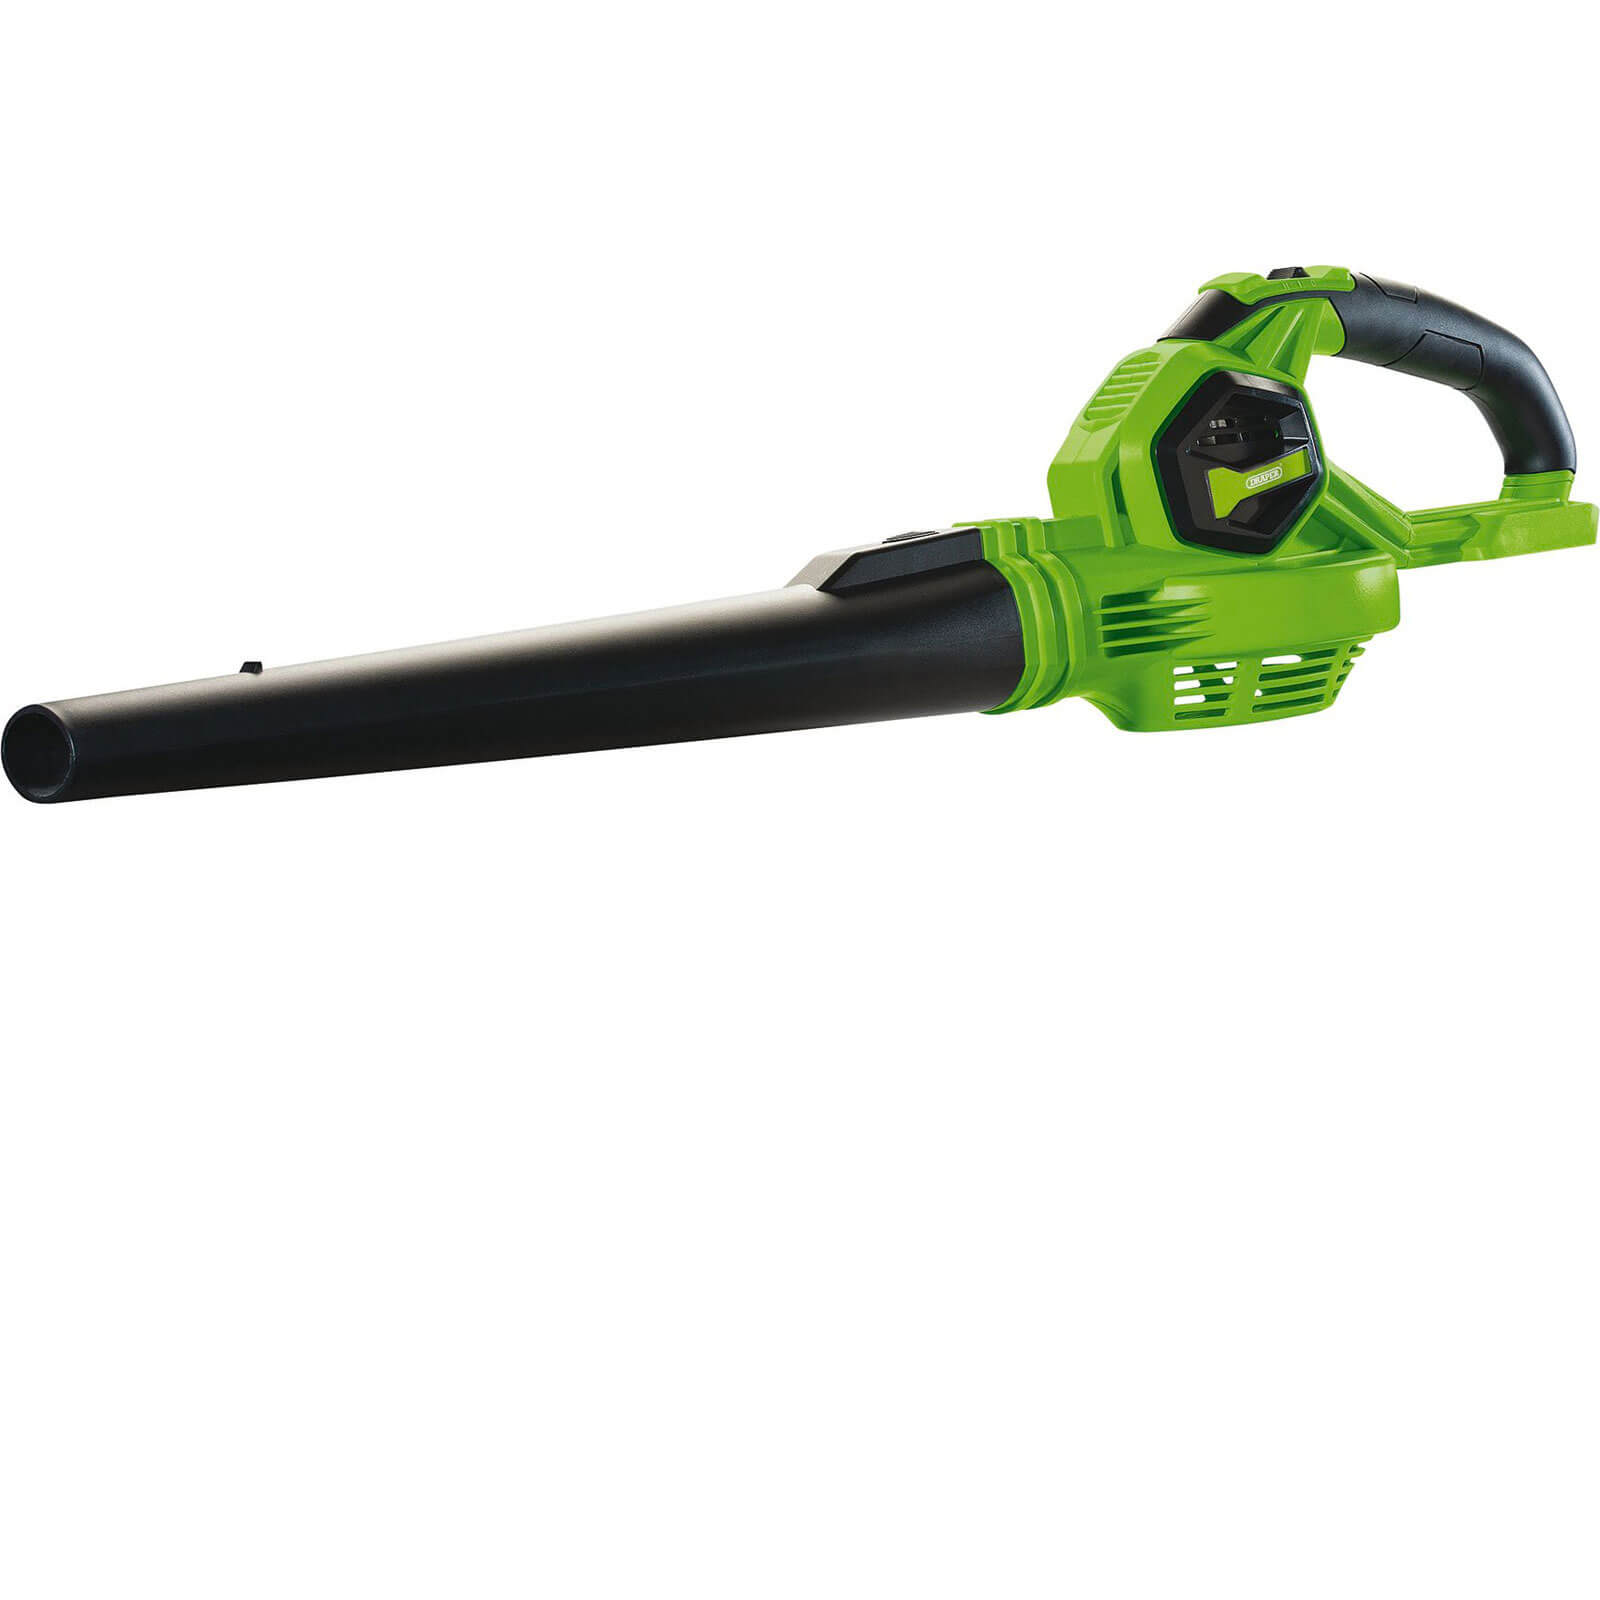 Draper D20GLB 20v Cordless Leaf Blower No Batteries No Charger